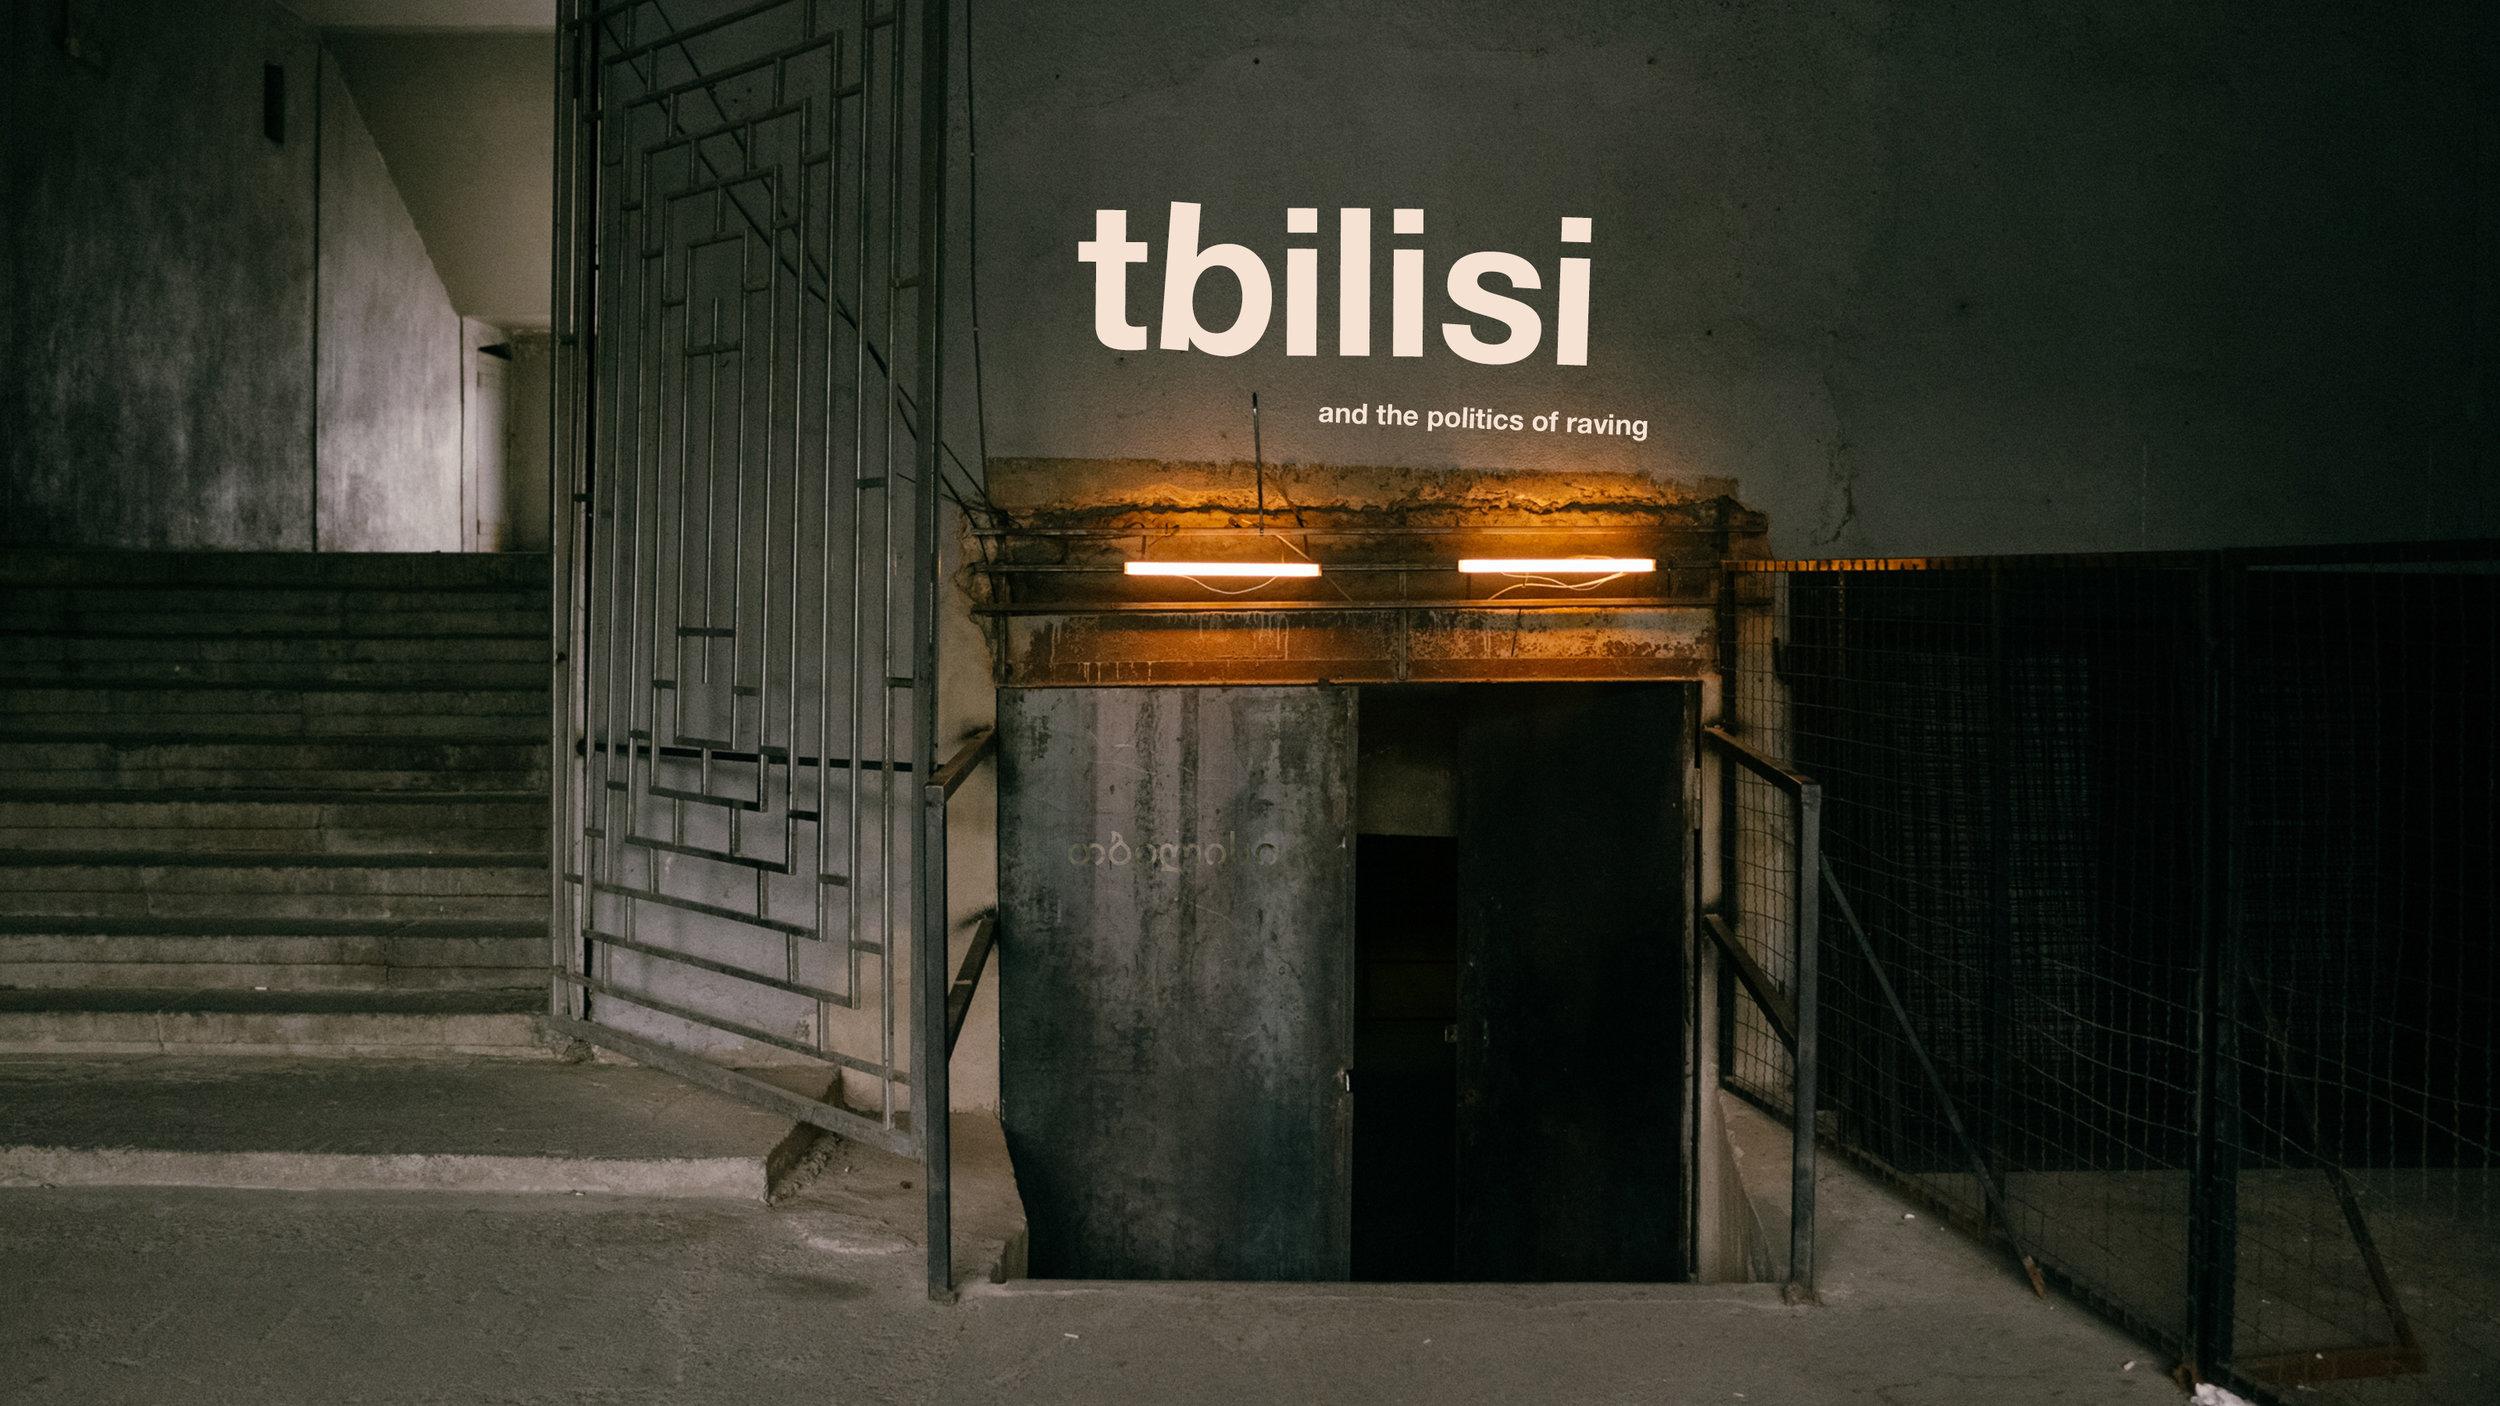 tbilisi-politics-of-raving.jpg